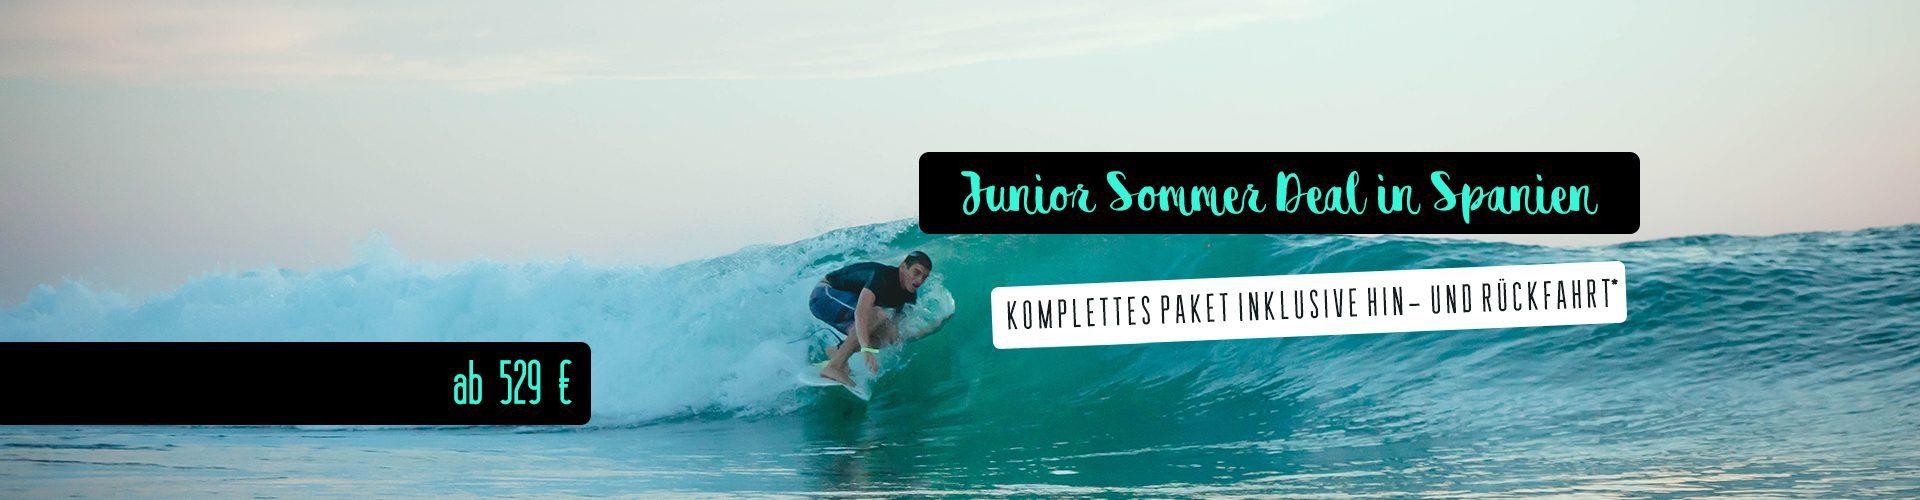 Junior Sommer Deal in Spanien